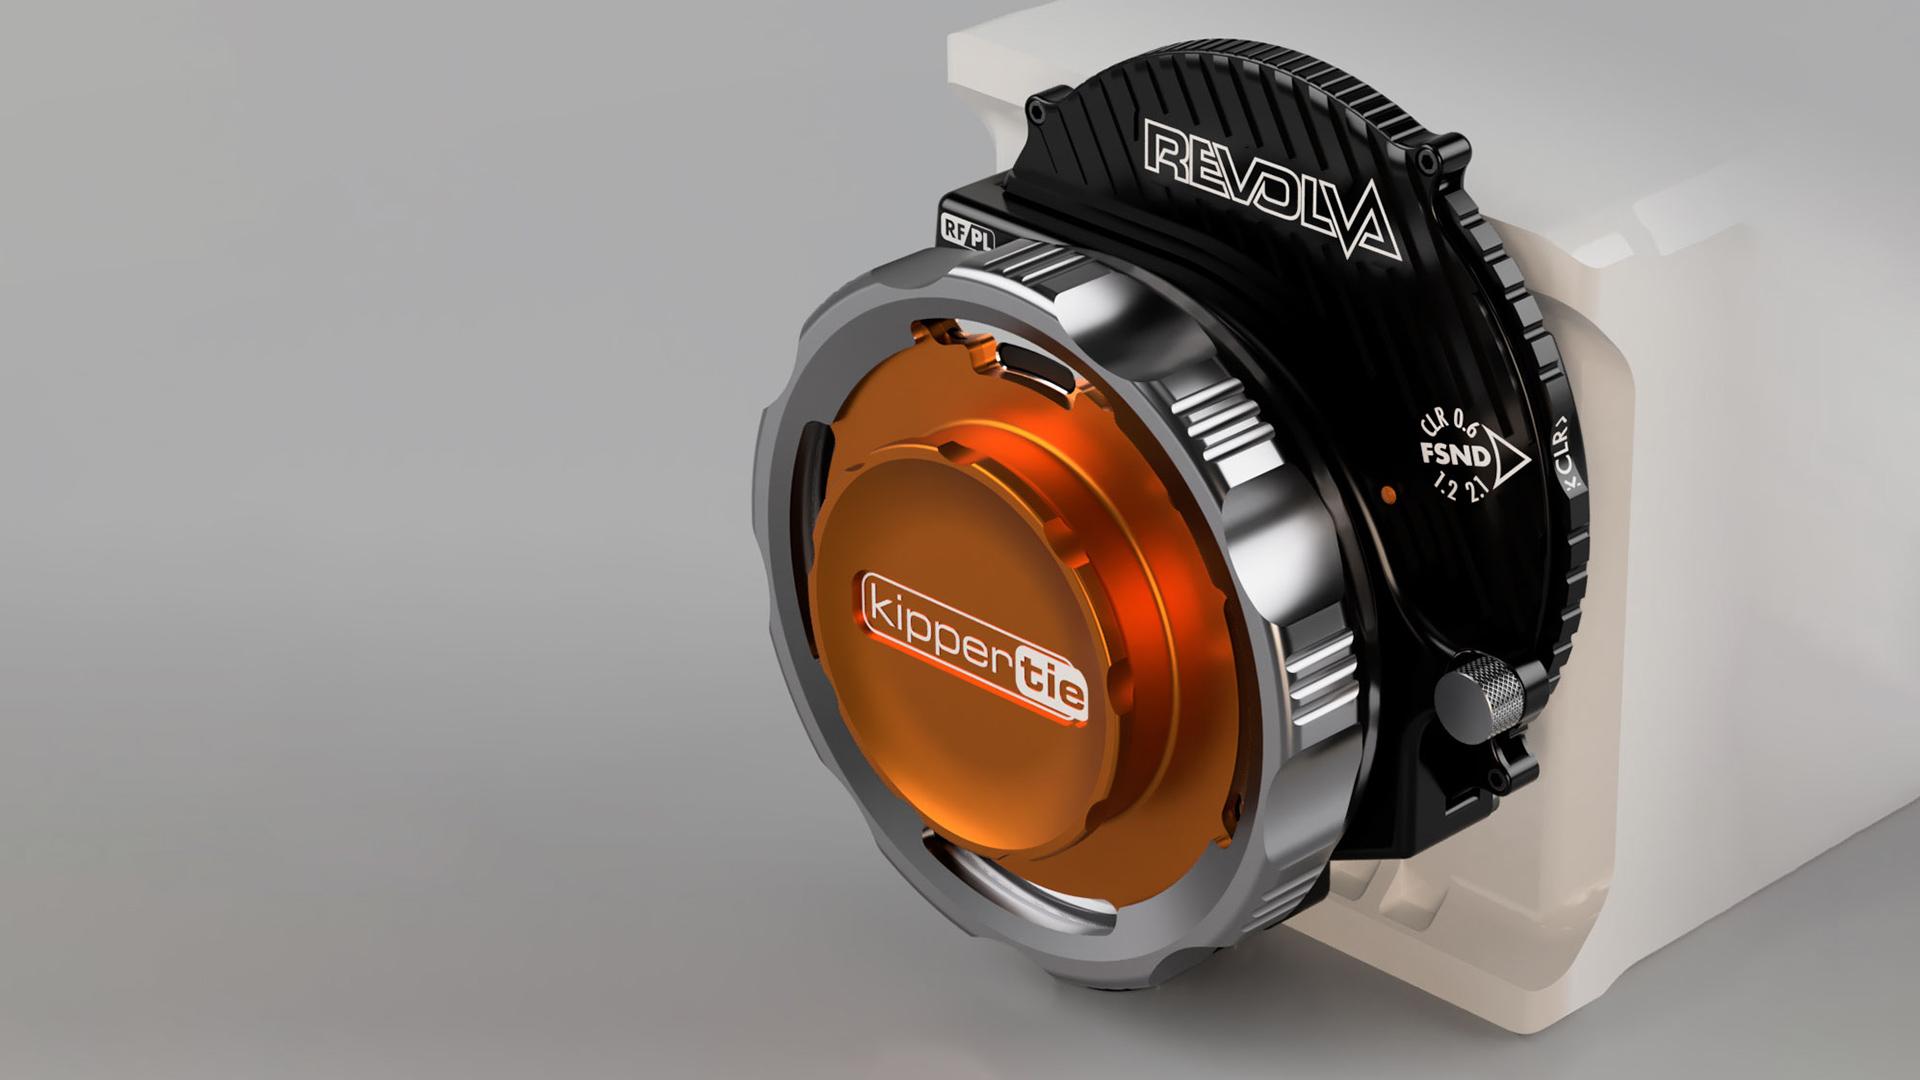 The Kippertie RF/PL combination filter mount. Image: Kippertie.